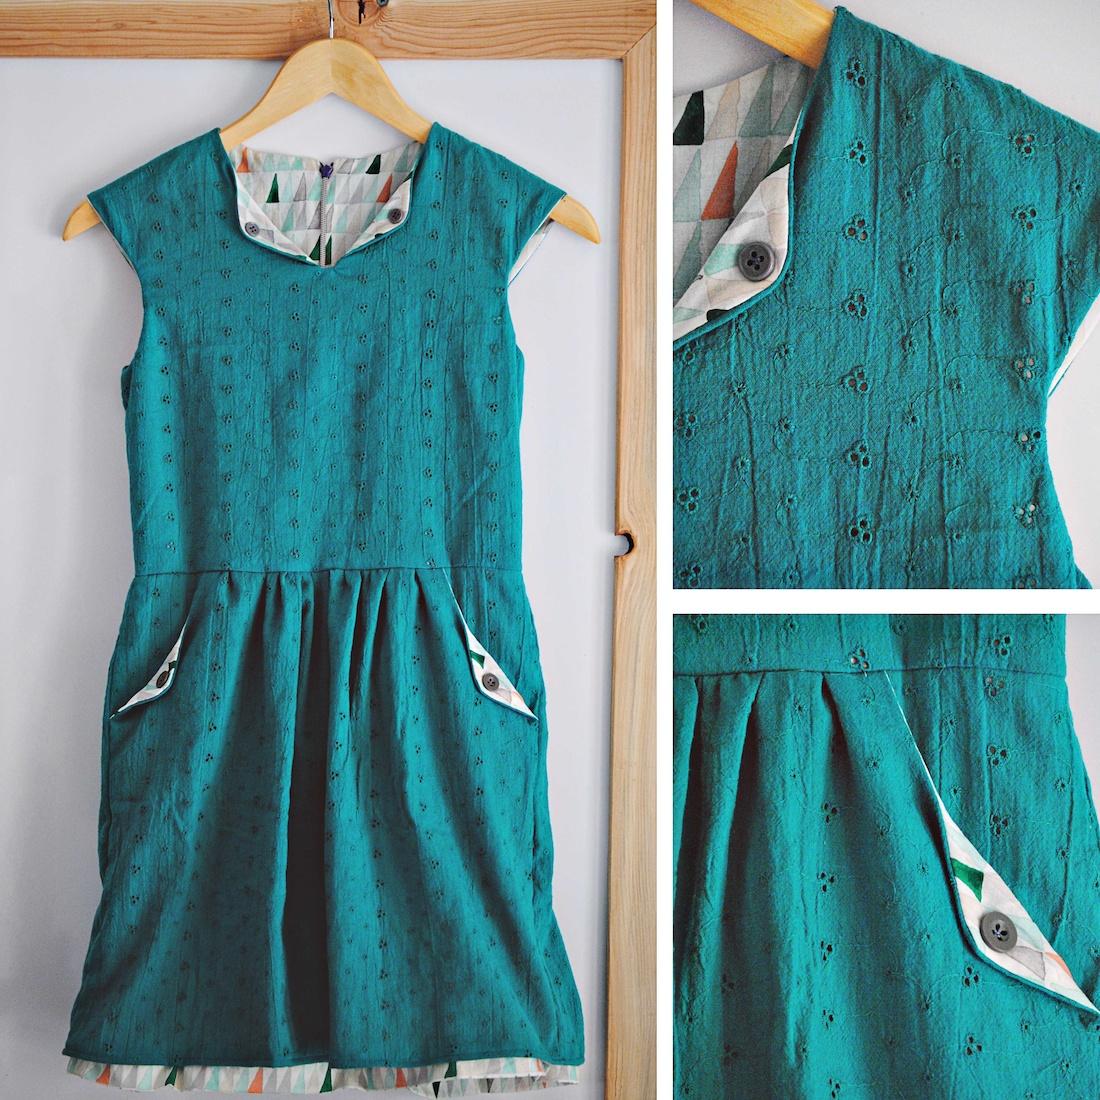 Compagnie-M_Lotta_dress_Dandeliondrift 1